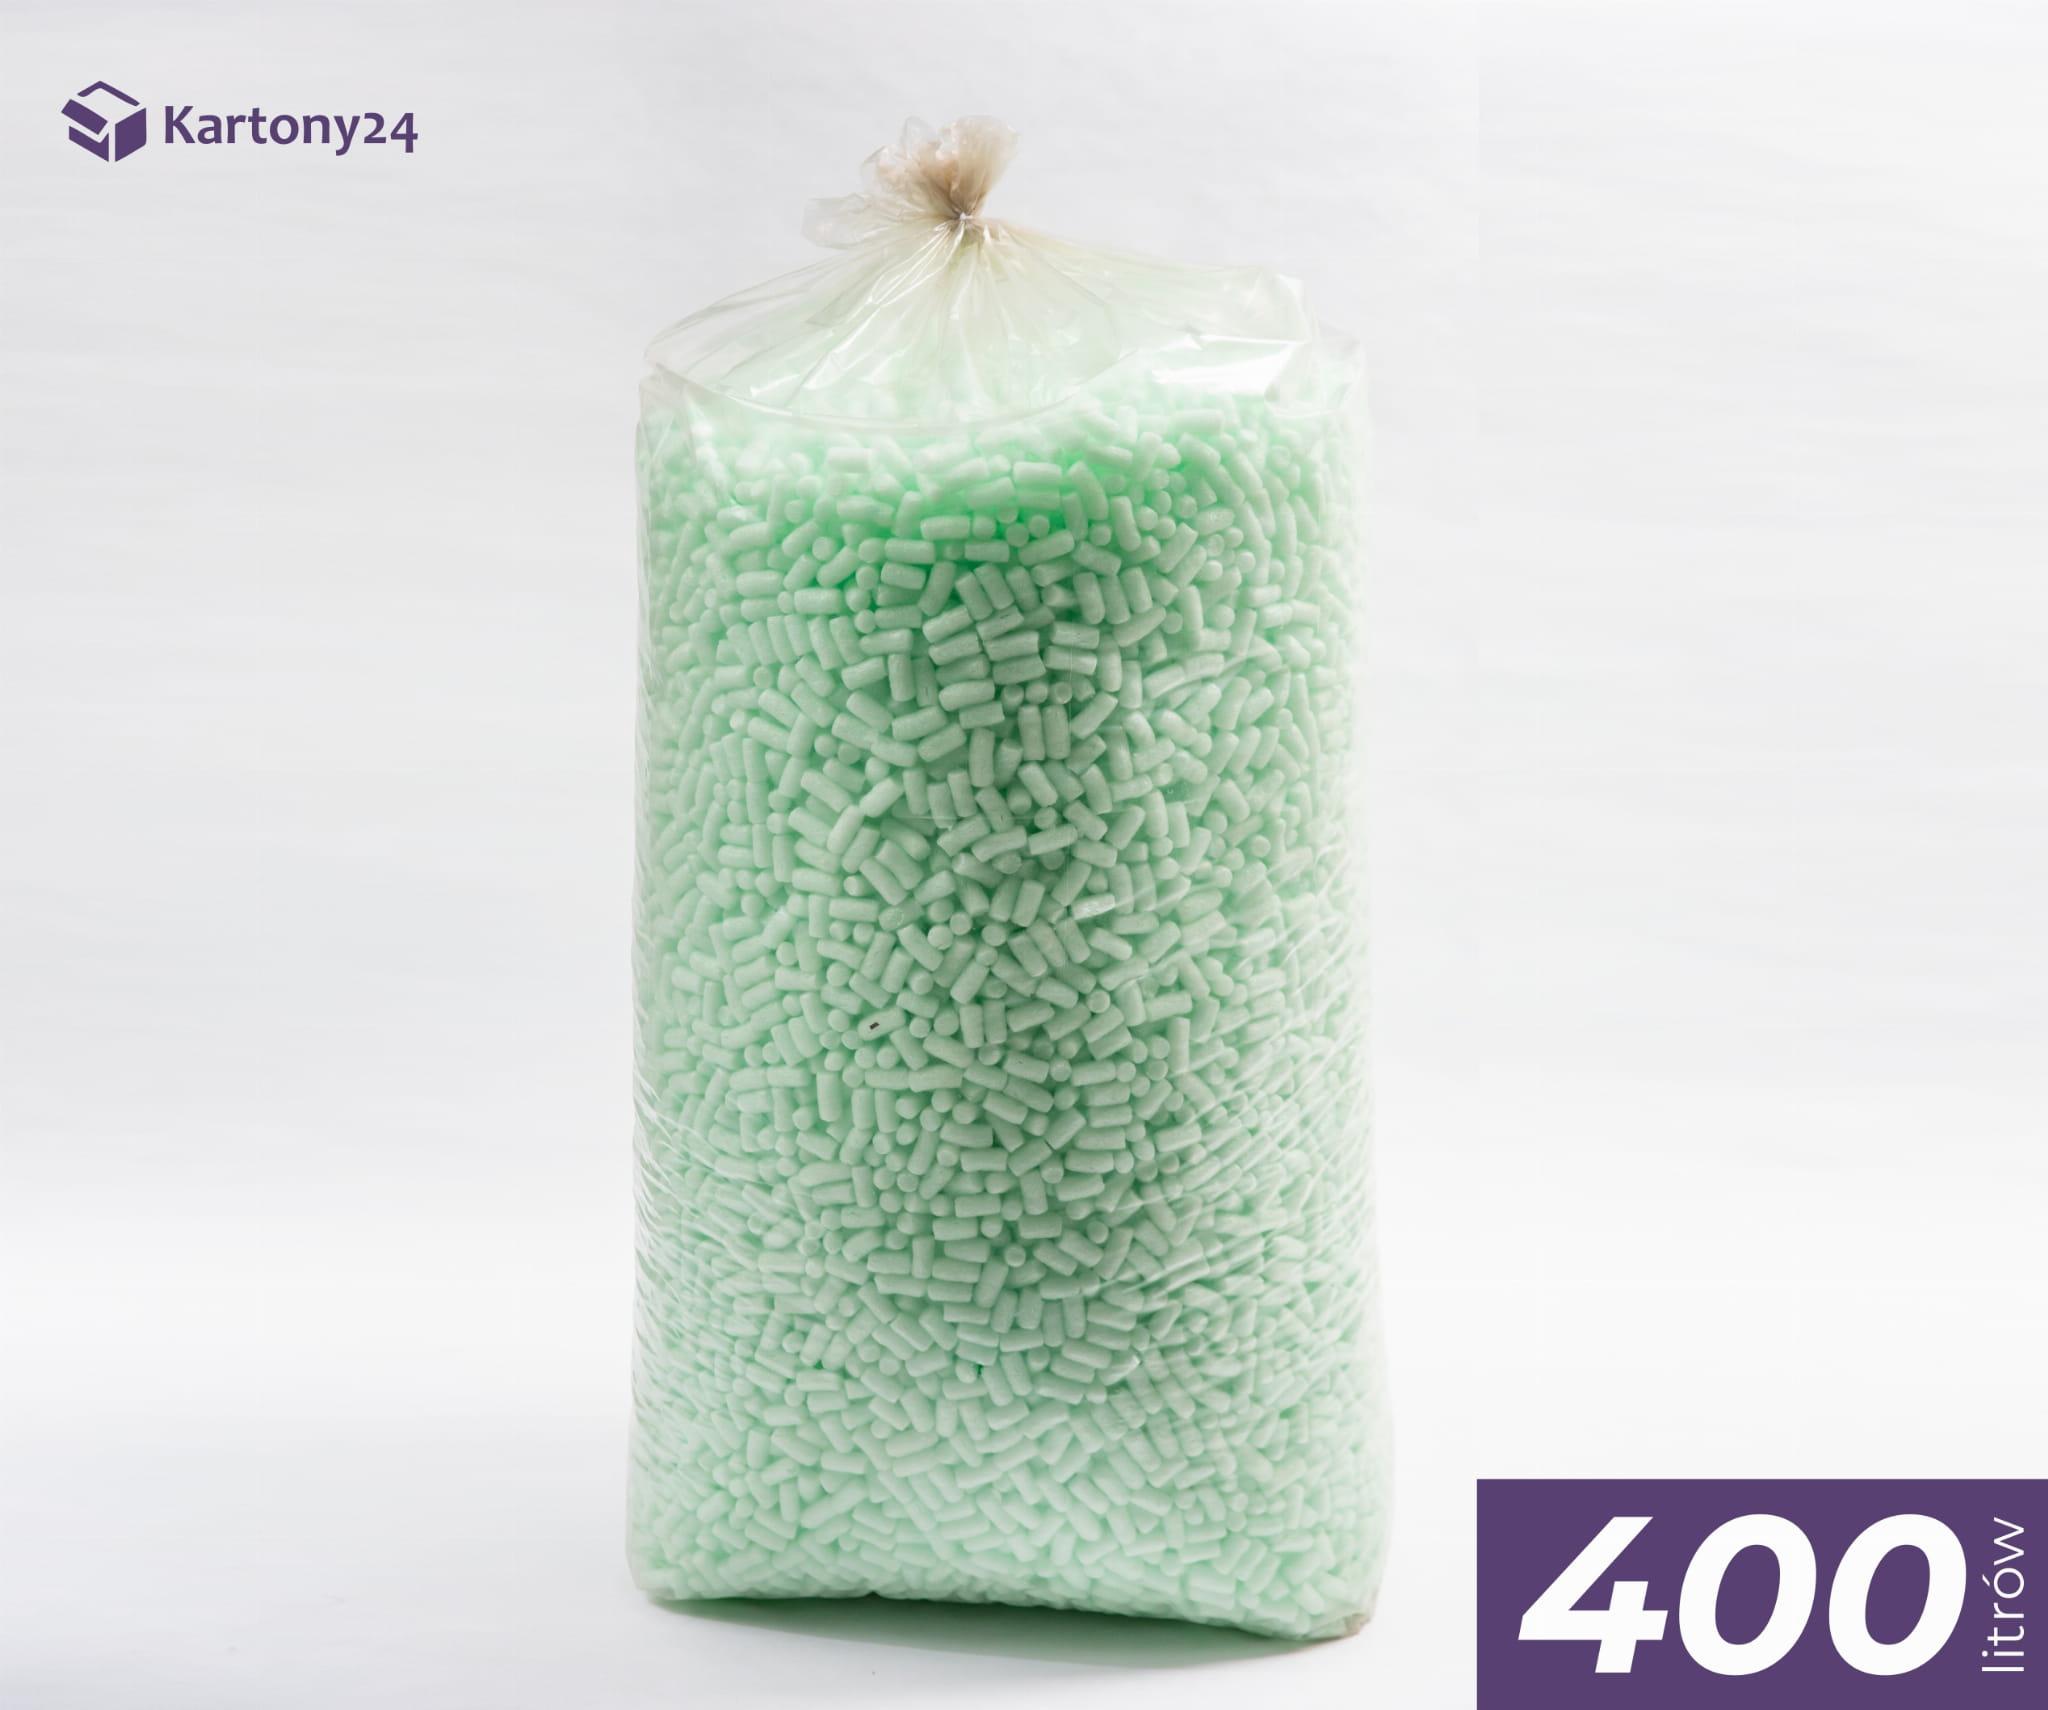 Skropak zielony 400 l